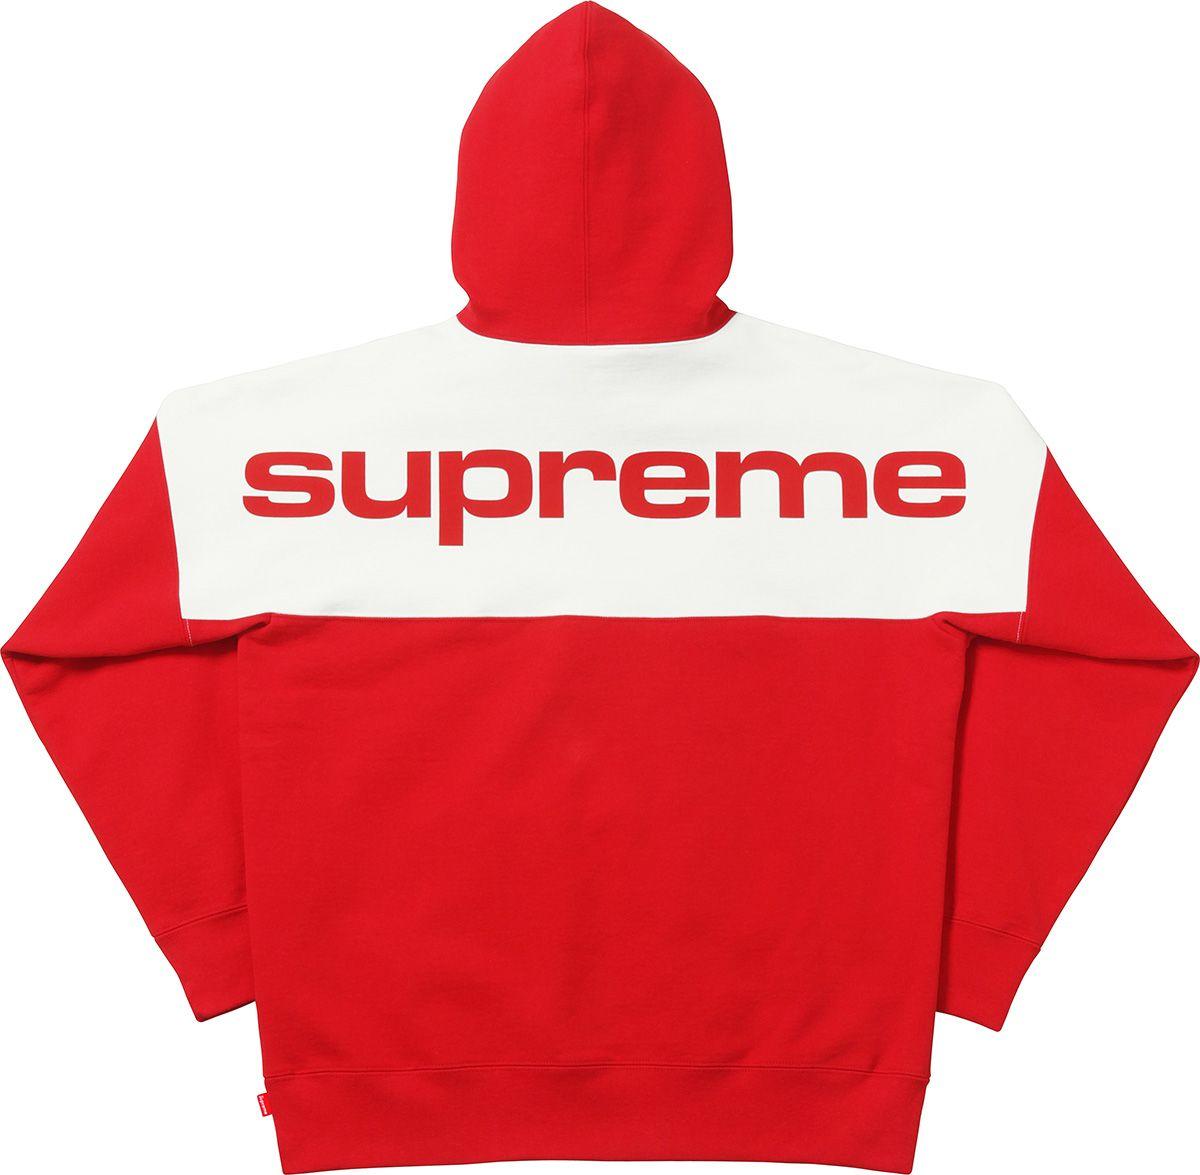 Supreme Supreme Champion Stacked C Hooded Sweatshirt Sweatshirts Hooded Sweatshirts Fashion [ 1175 x 1200 Pixel ]